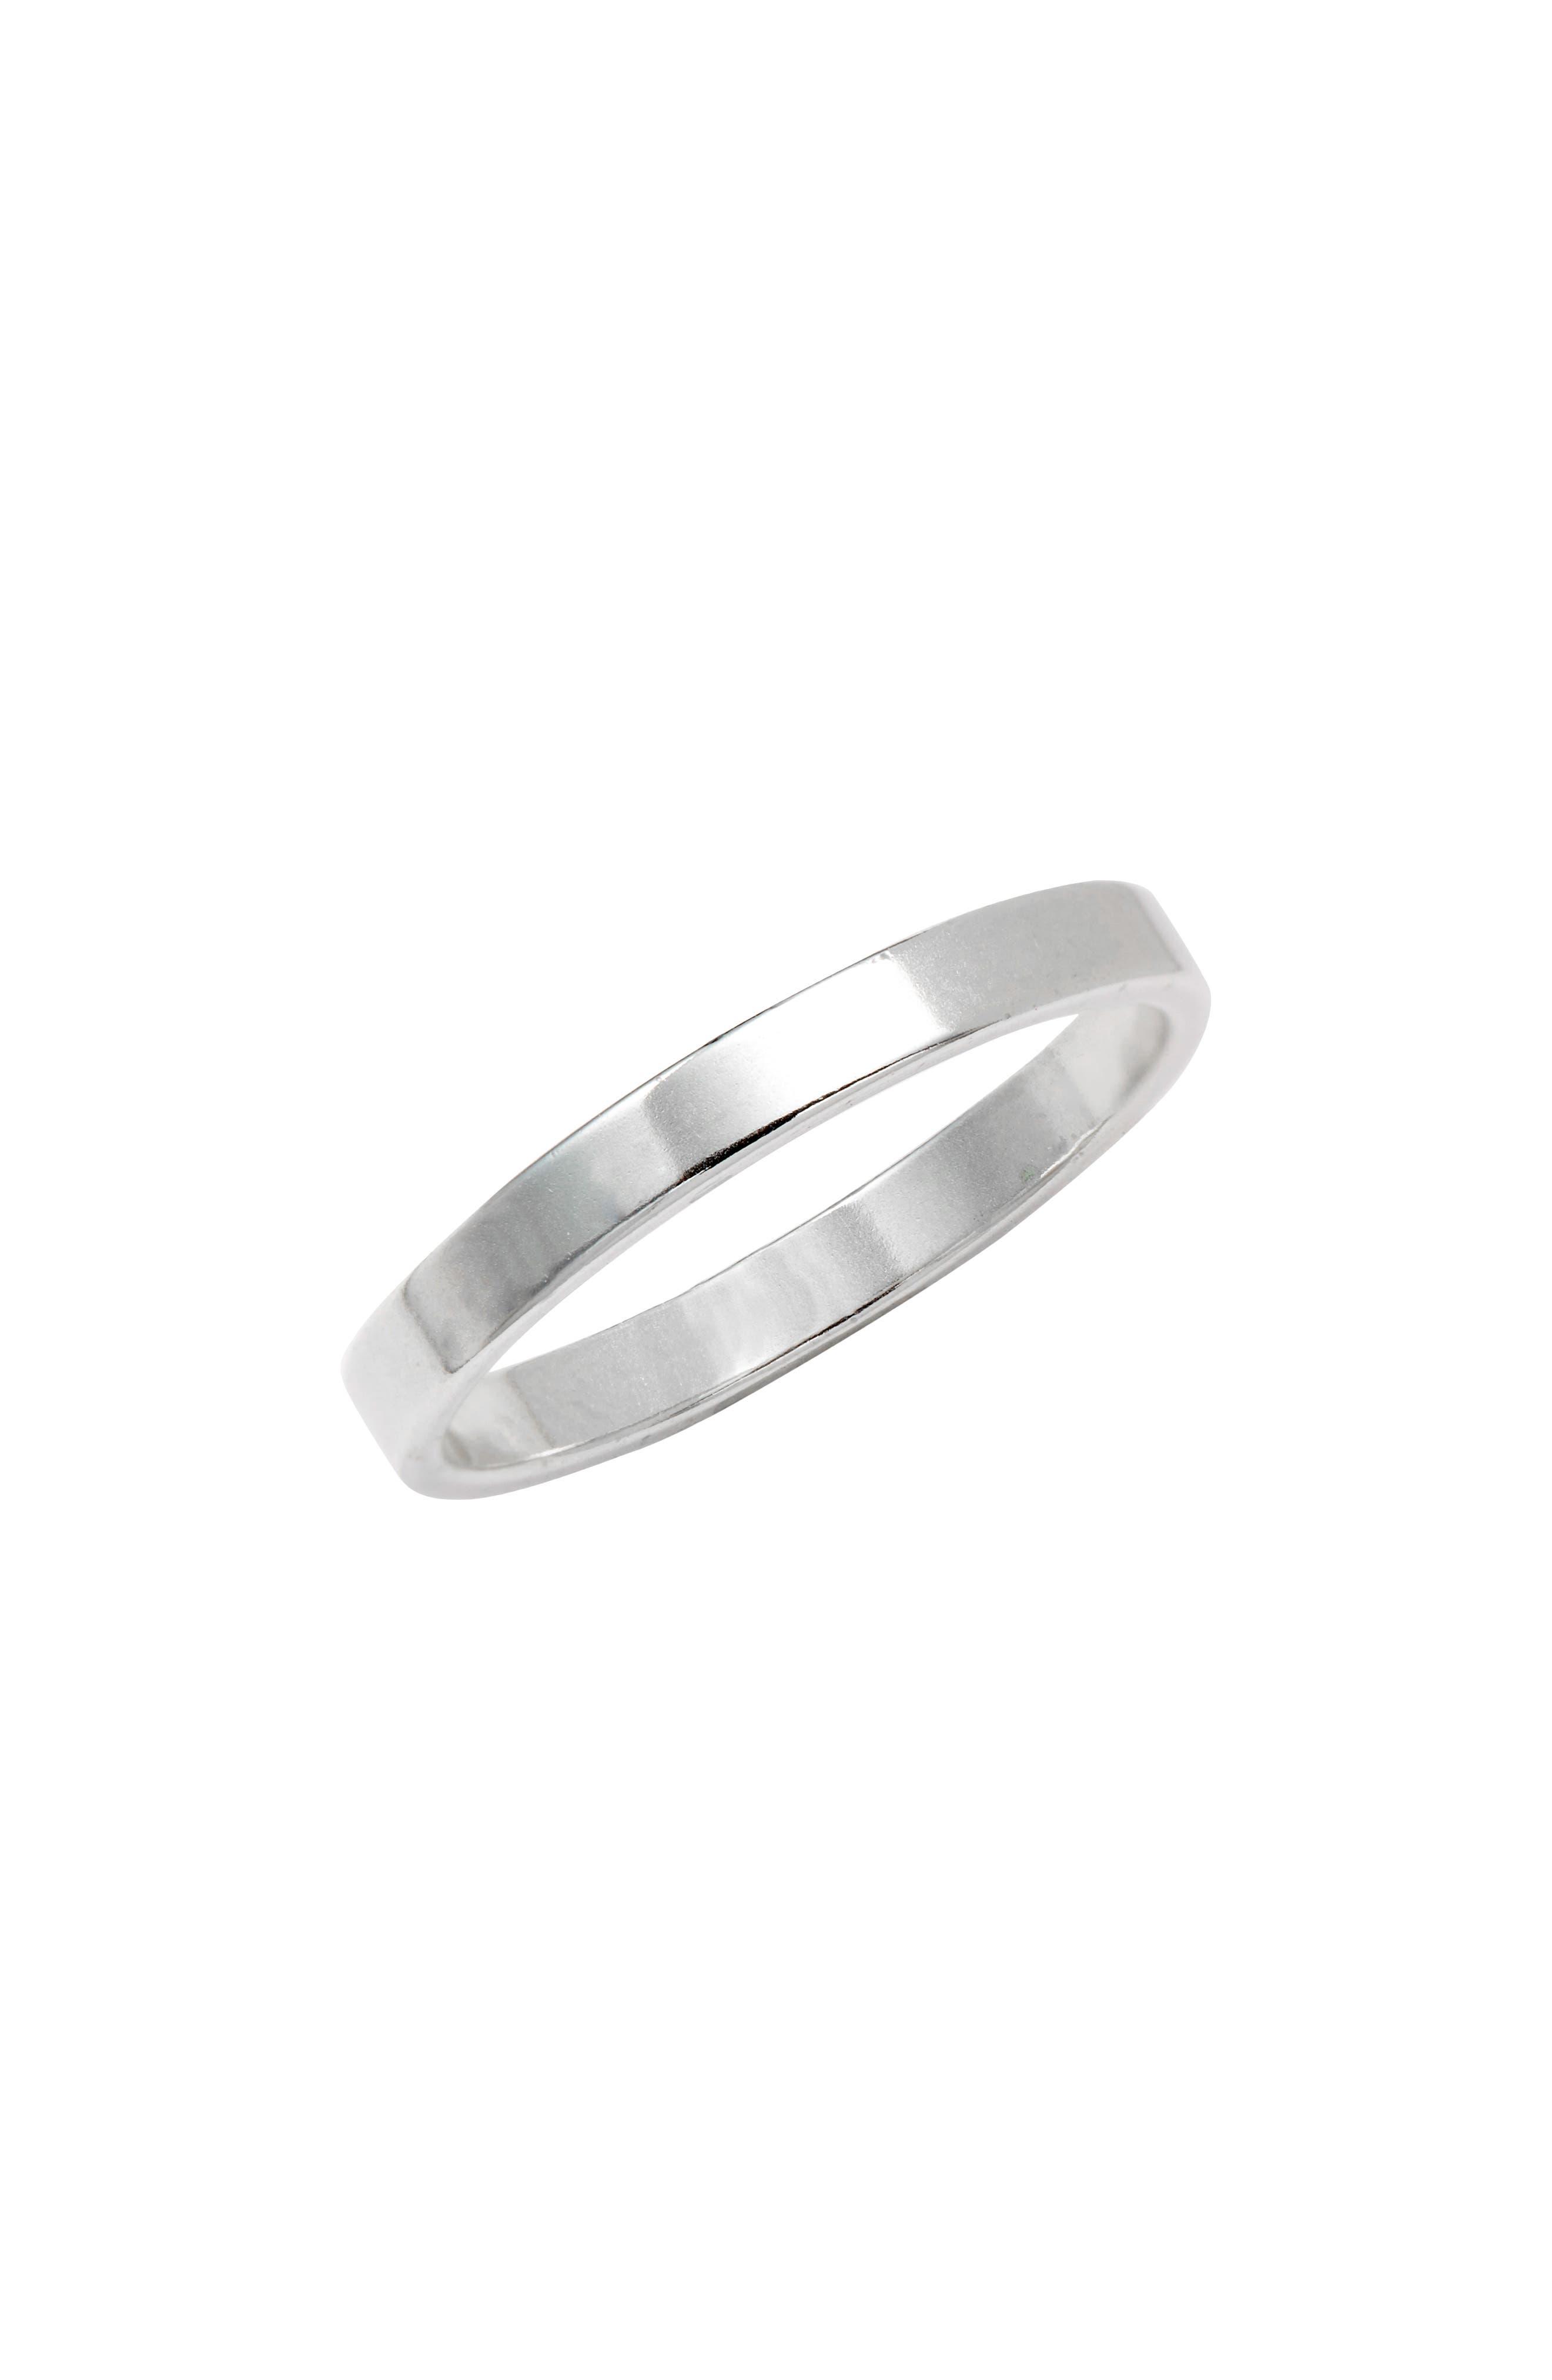 Minimal Sterling Silver Band Ring